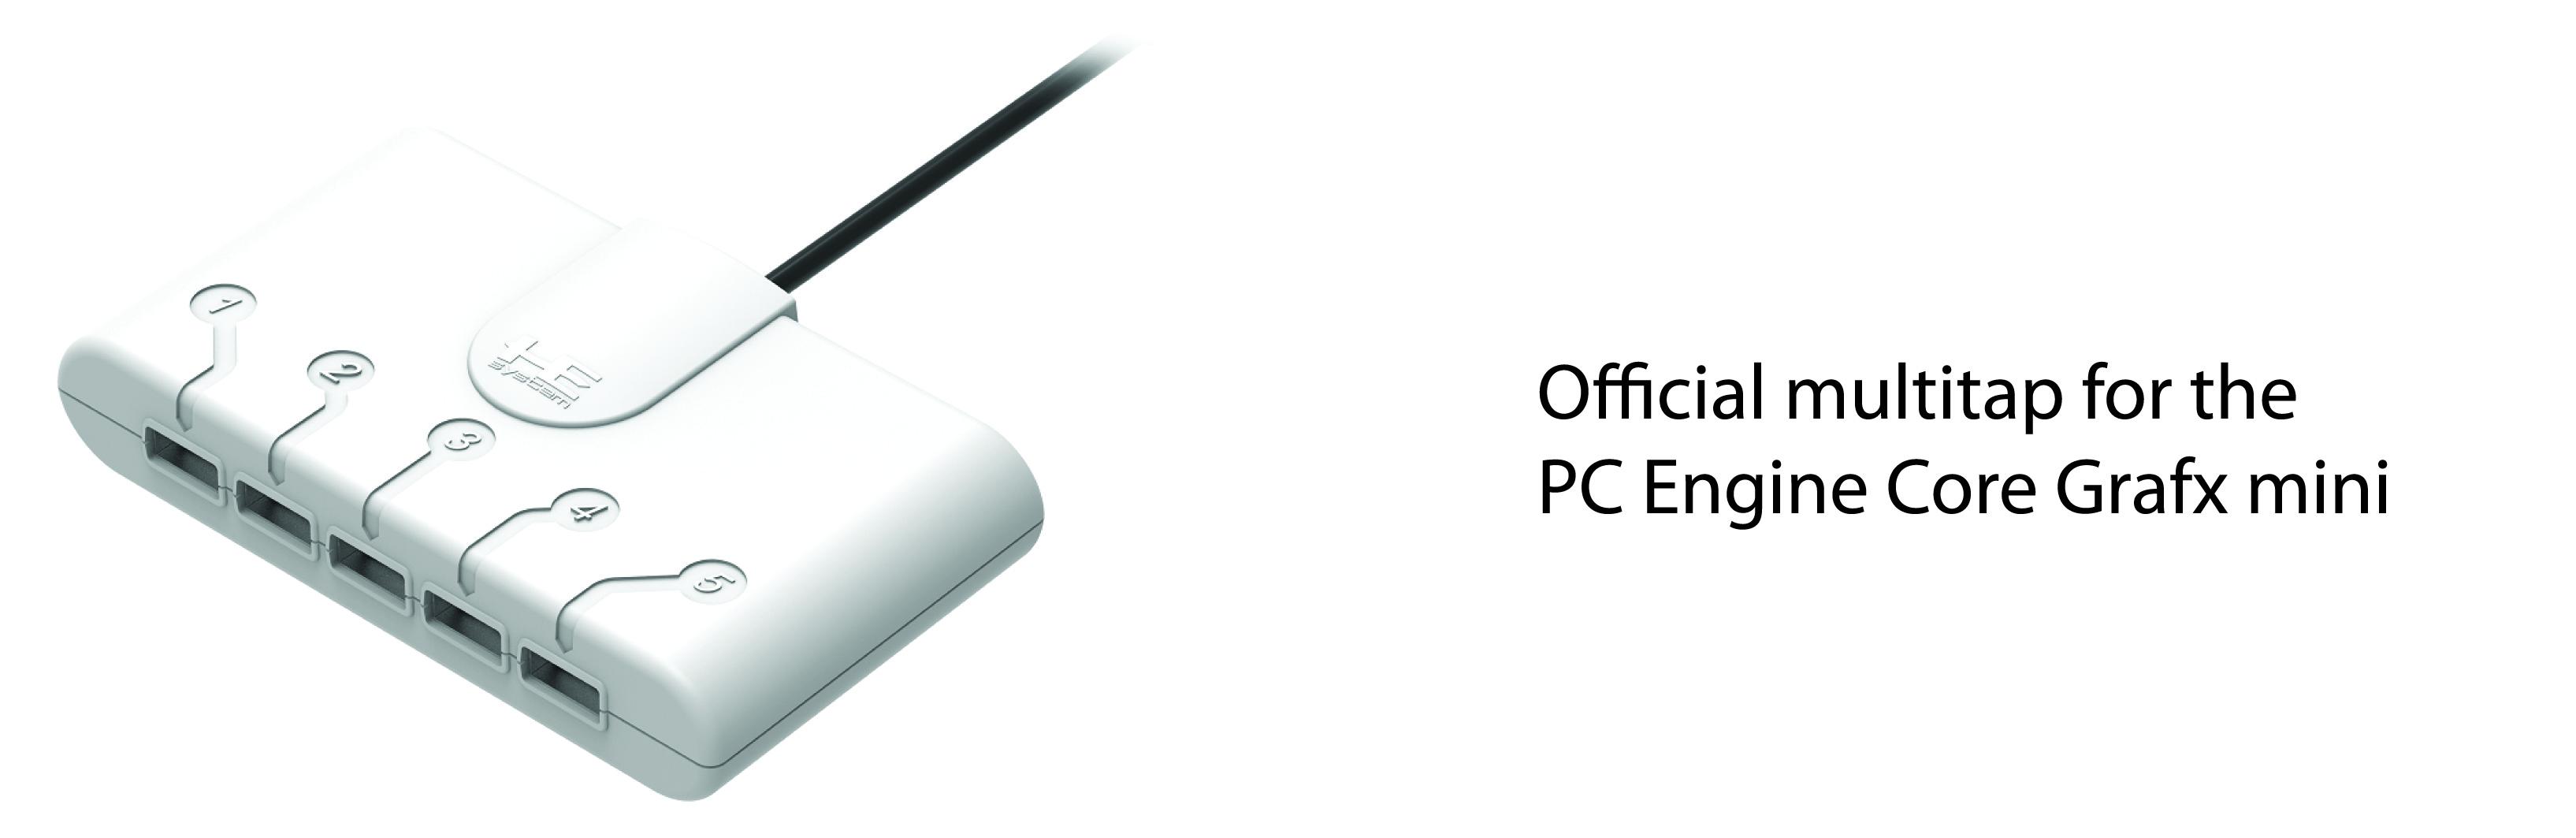 pc-engine-core-grafx-mini-multitap-a-1-uk.jpg